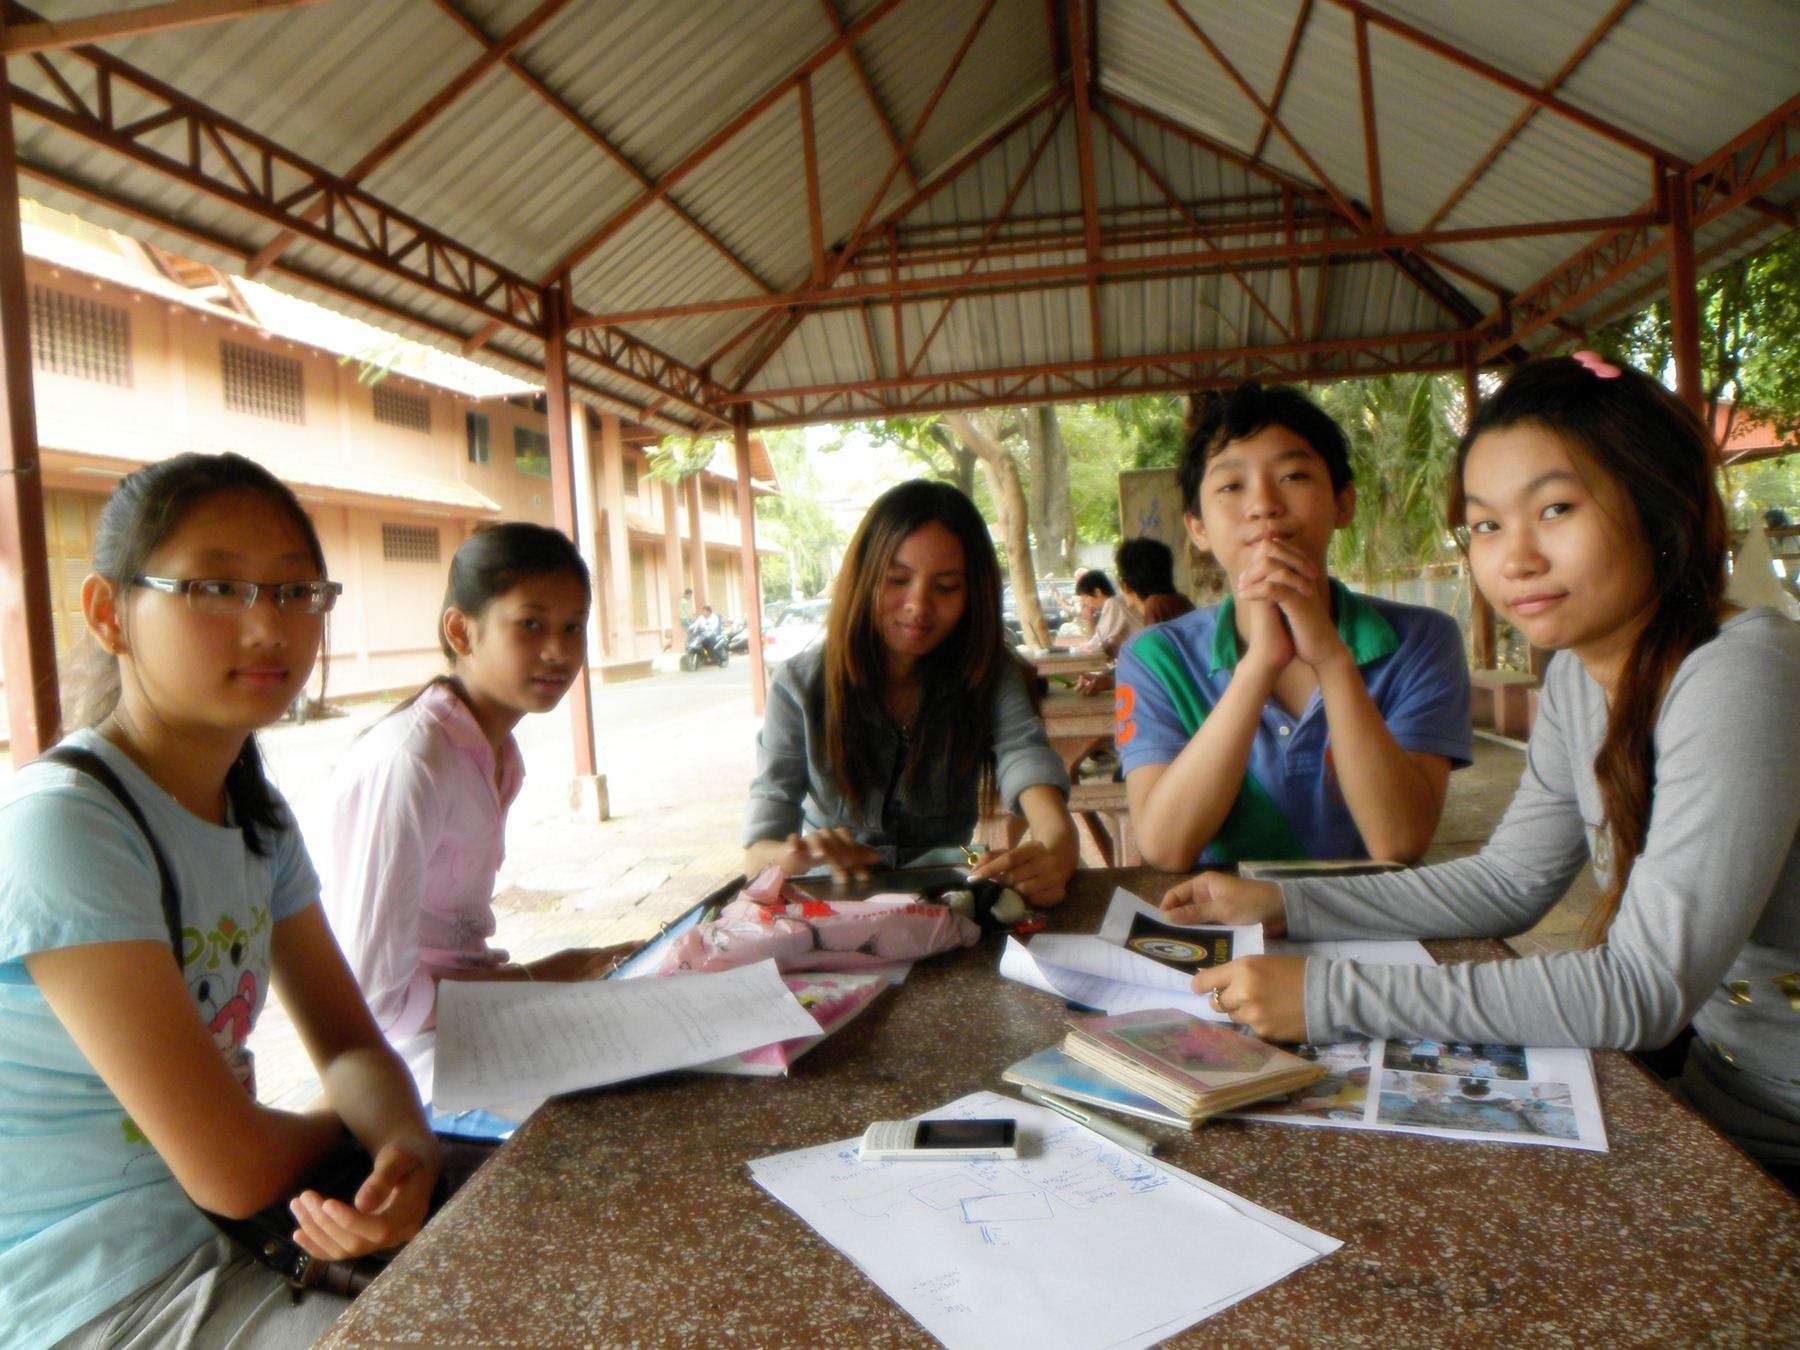 http://www.bcio.org/countries/cambodia/DSCN1752.JPG